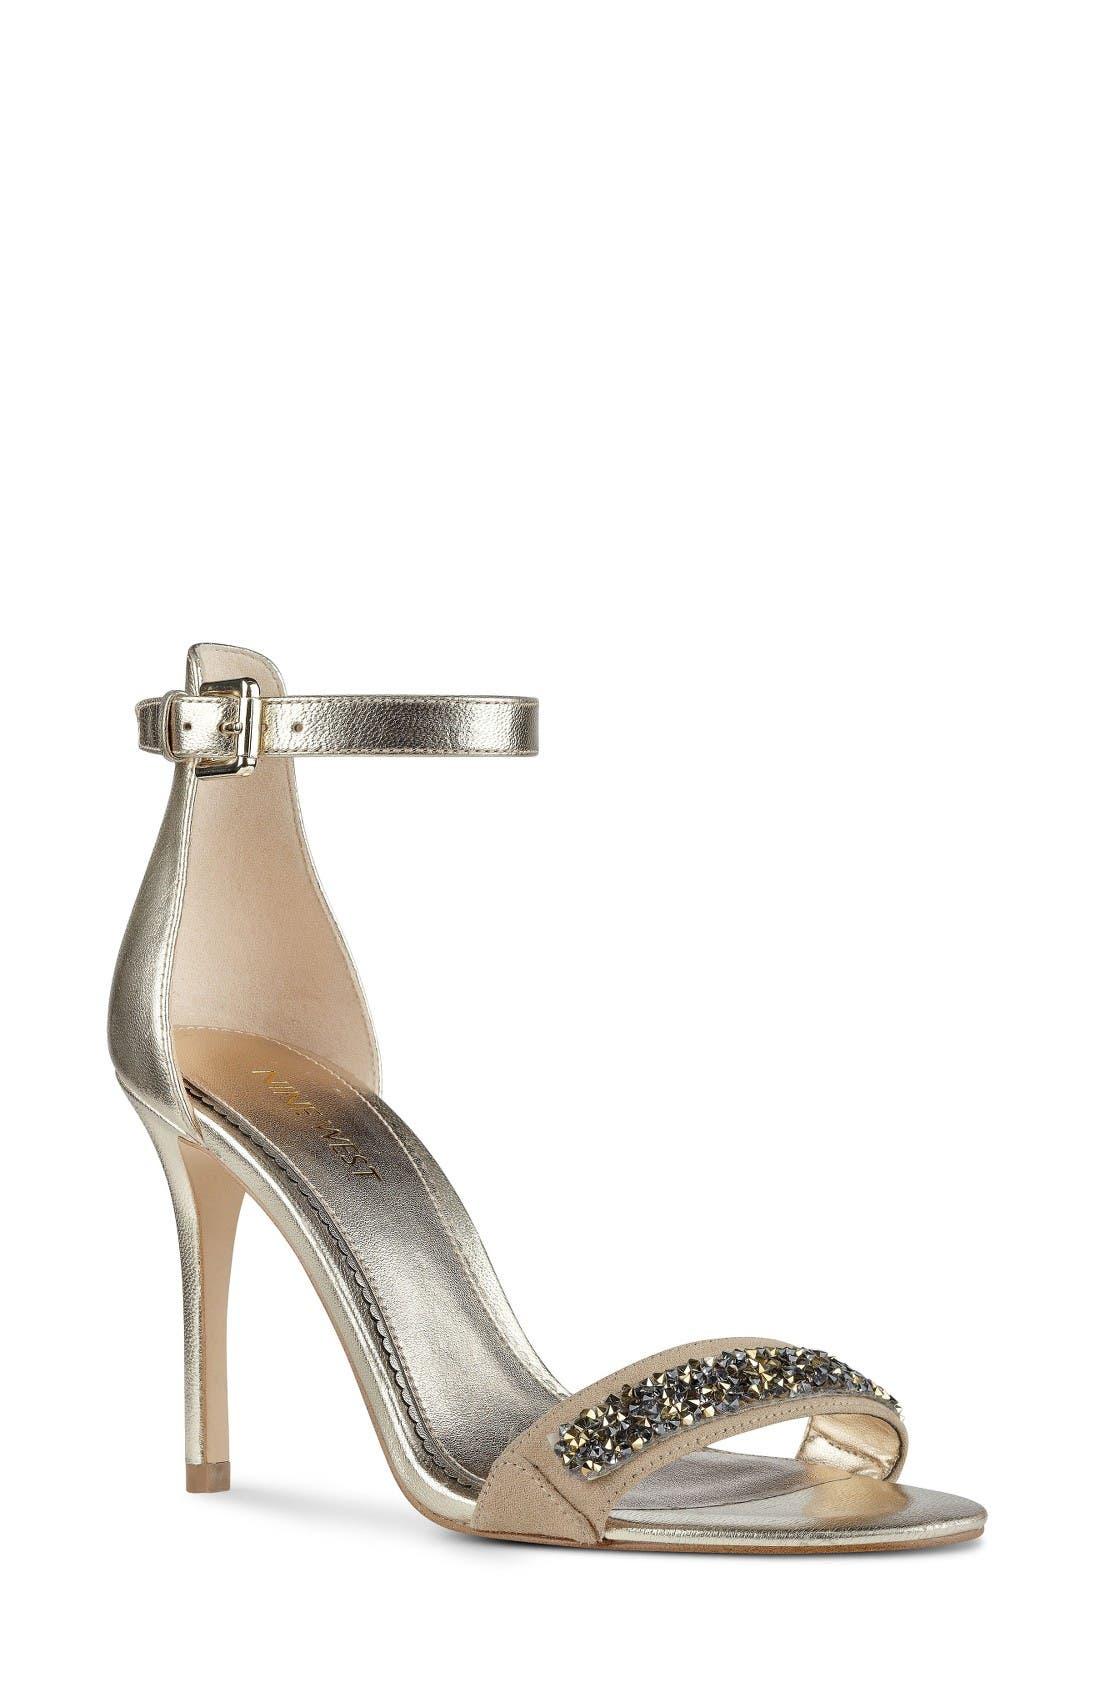 Alternate Image 1 Selected - Nine West 'Mana' Ankle Strap Sandal (Women)